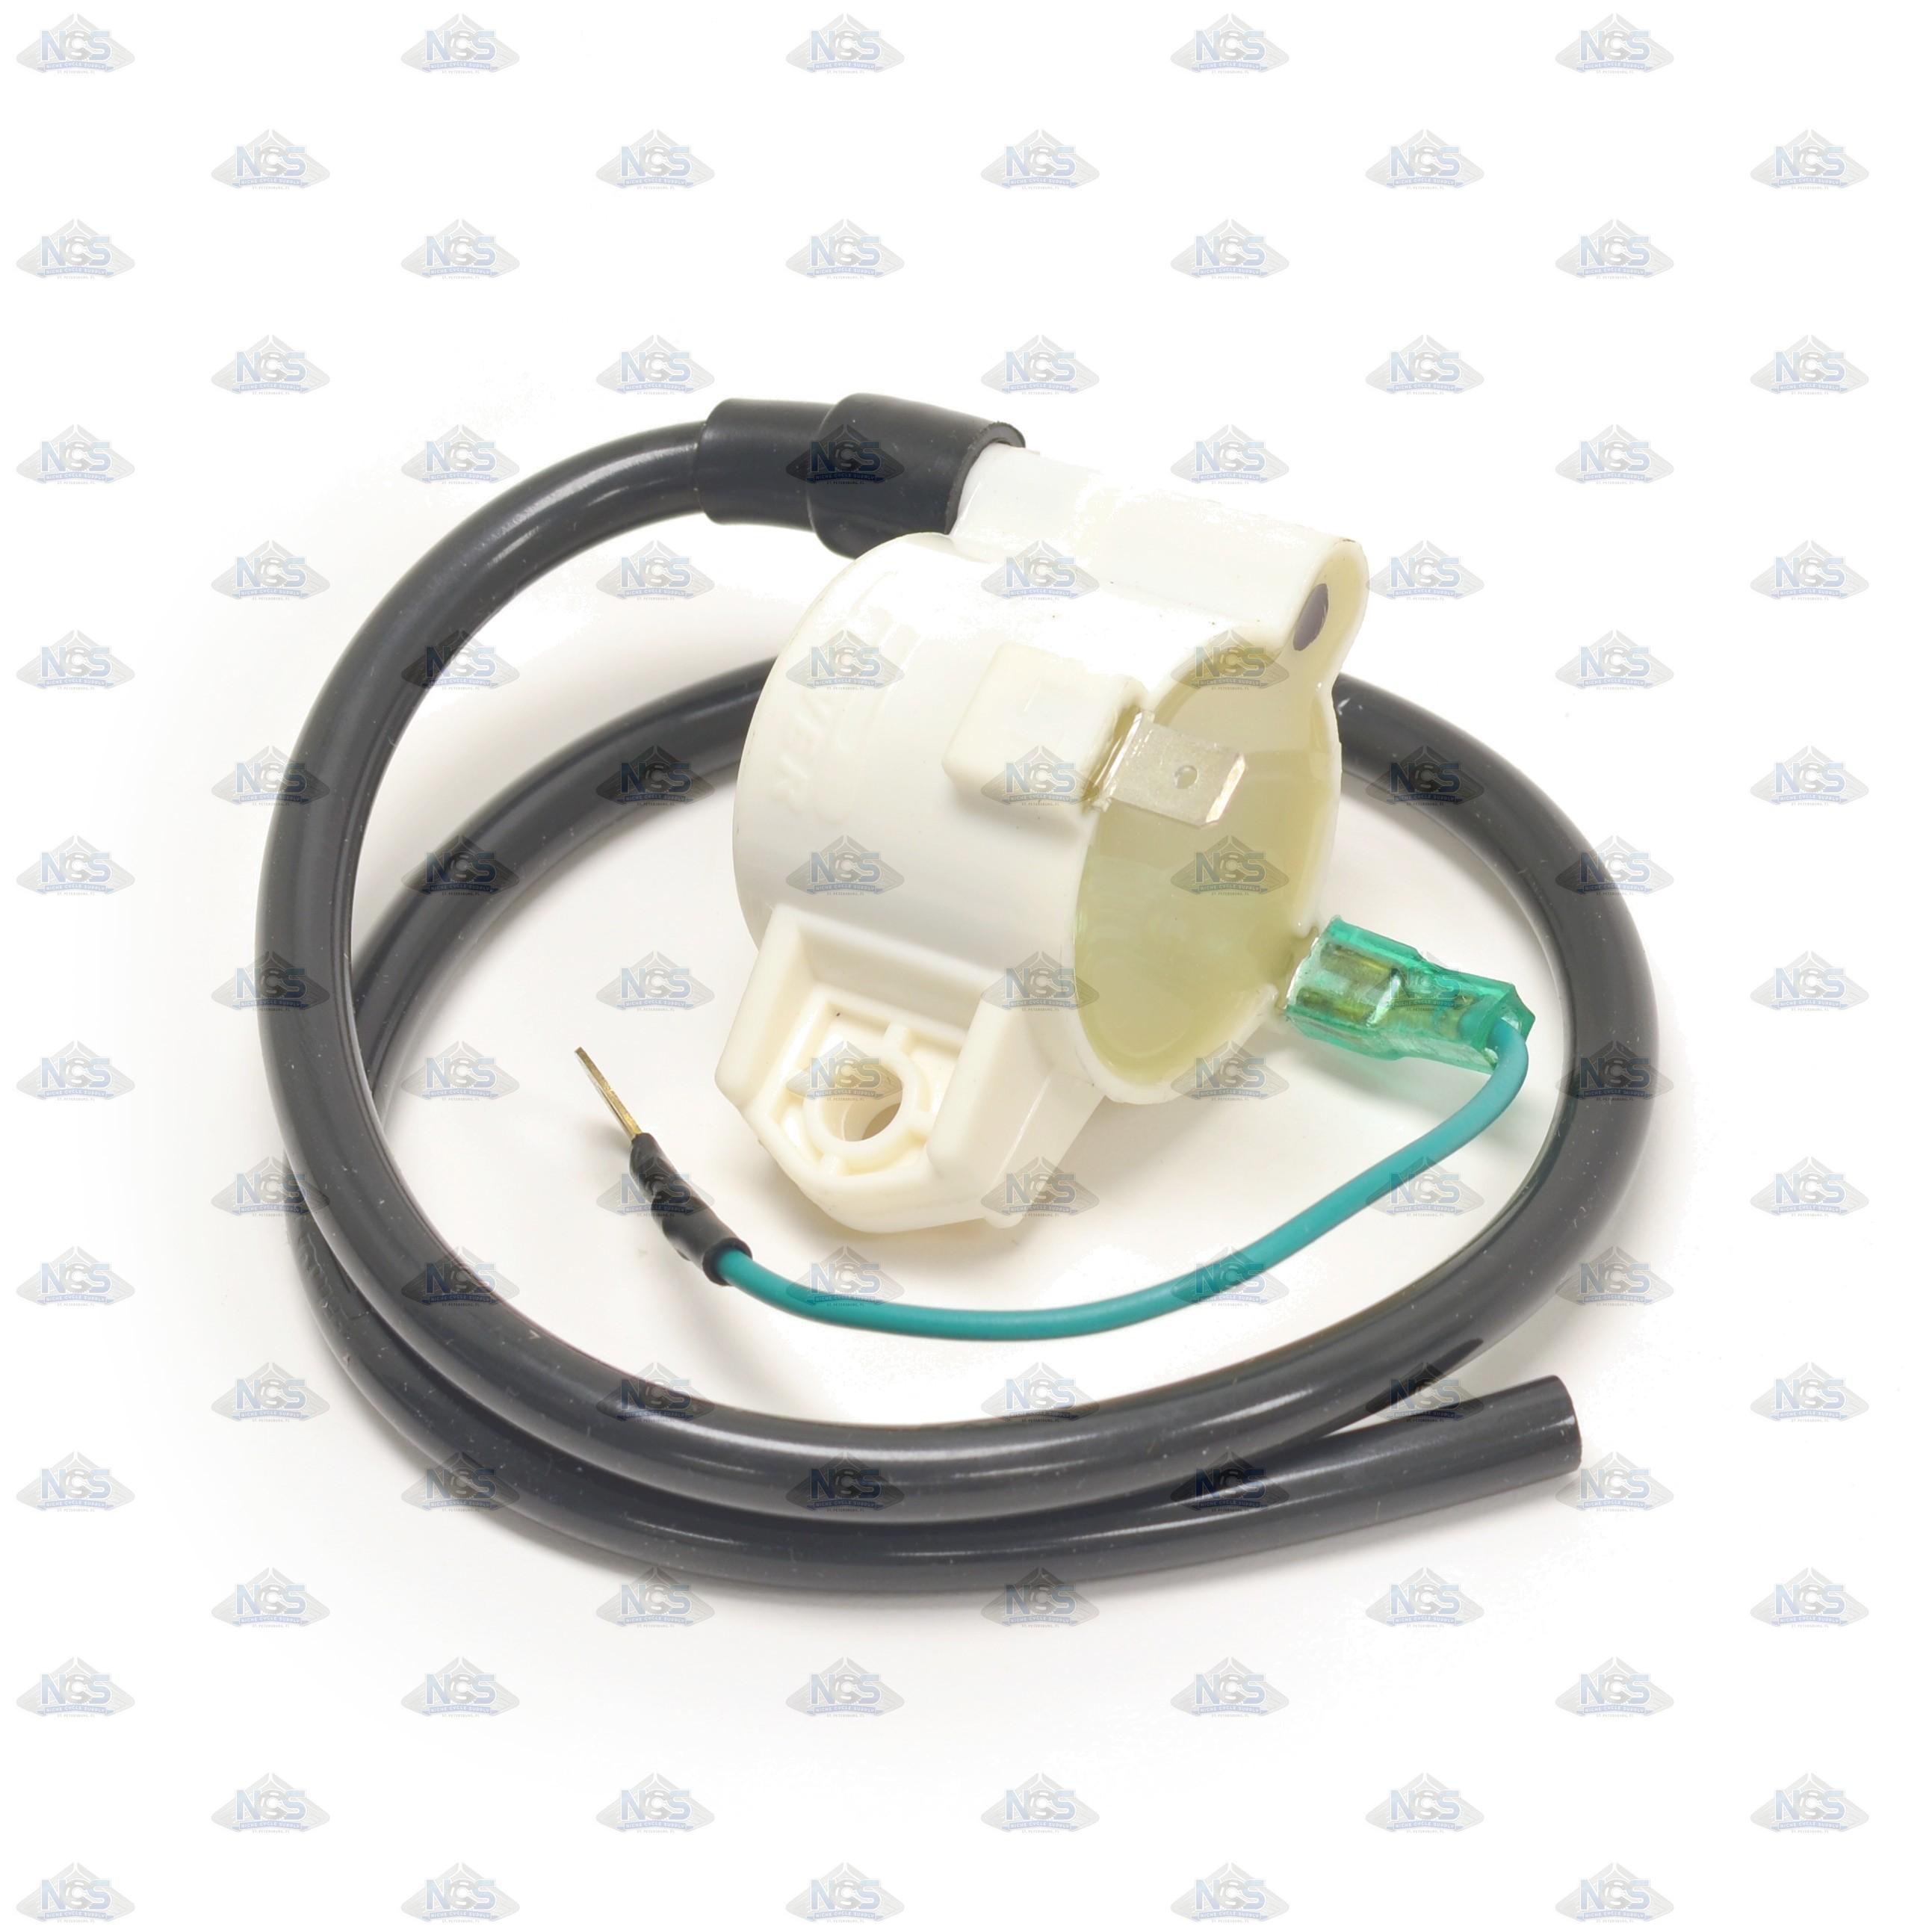 wiring diagram of motorcycle honda xrm 110 three phase motor contactor 1980 cdi box repair ~ elsalvadorla